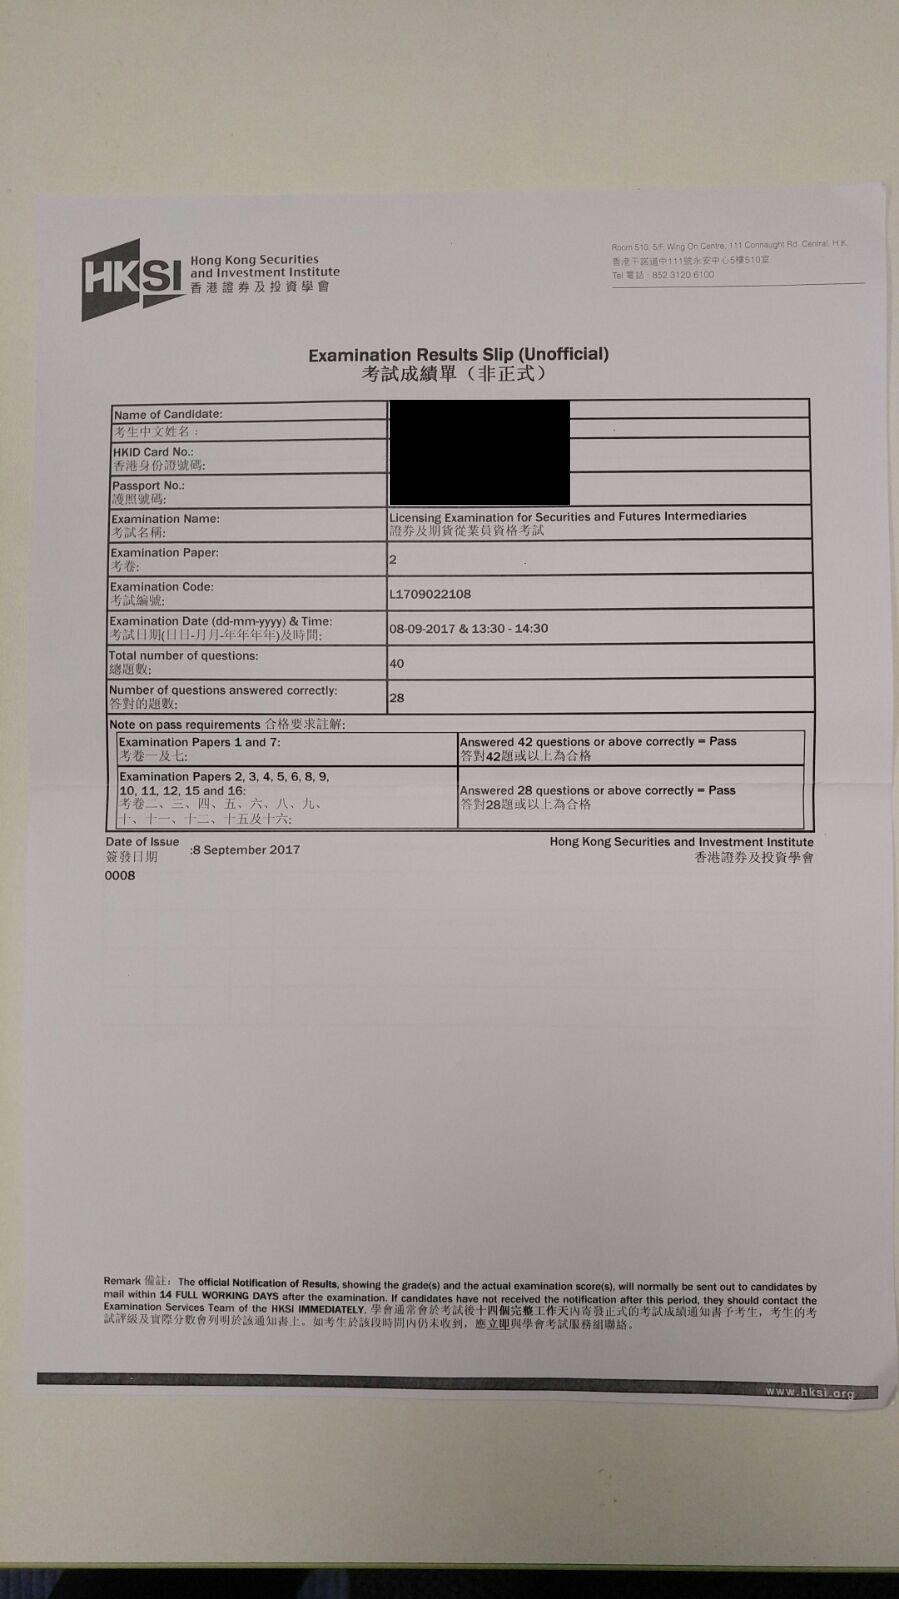 YKL 8/9/2017 LE Paper 2 證券期貨從業員資格考試卷二 Pass